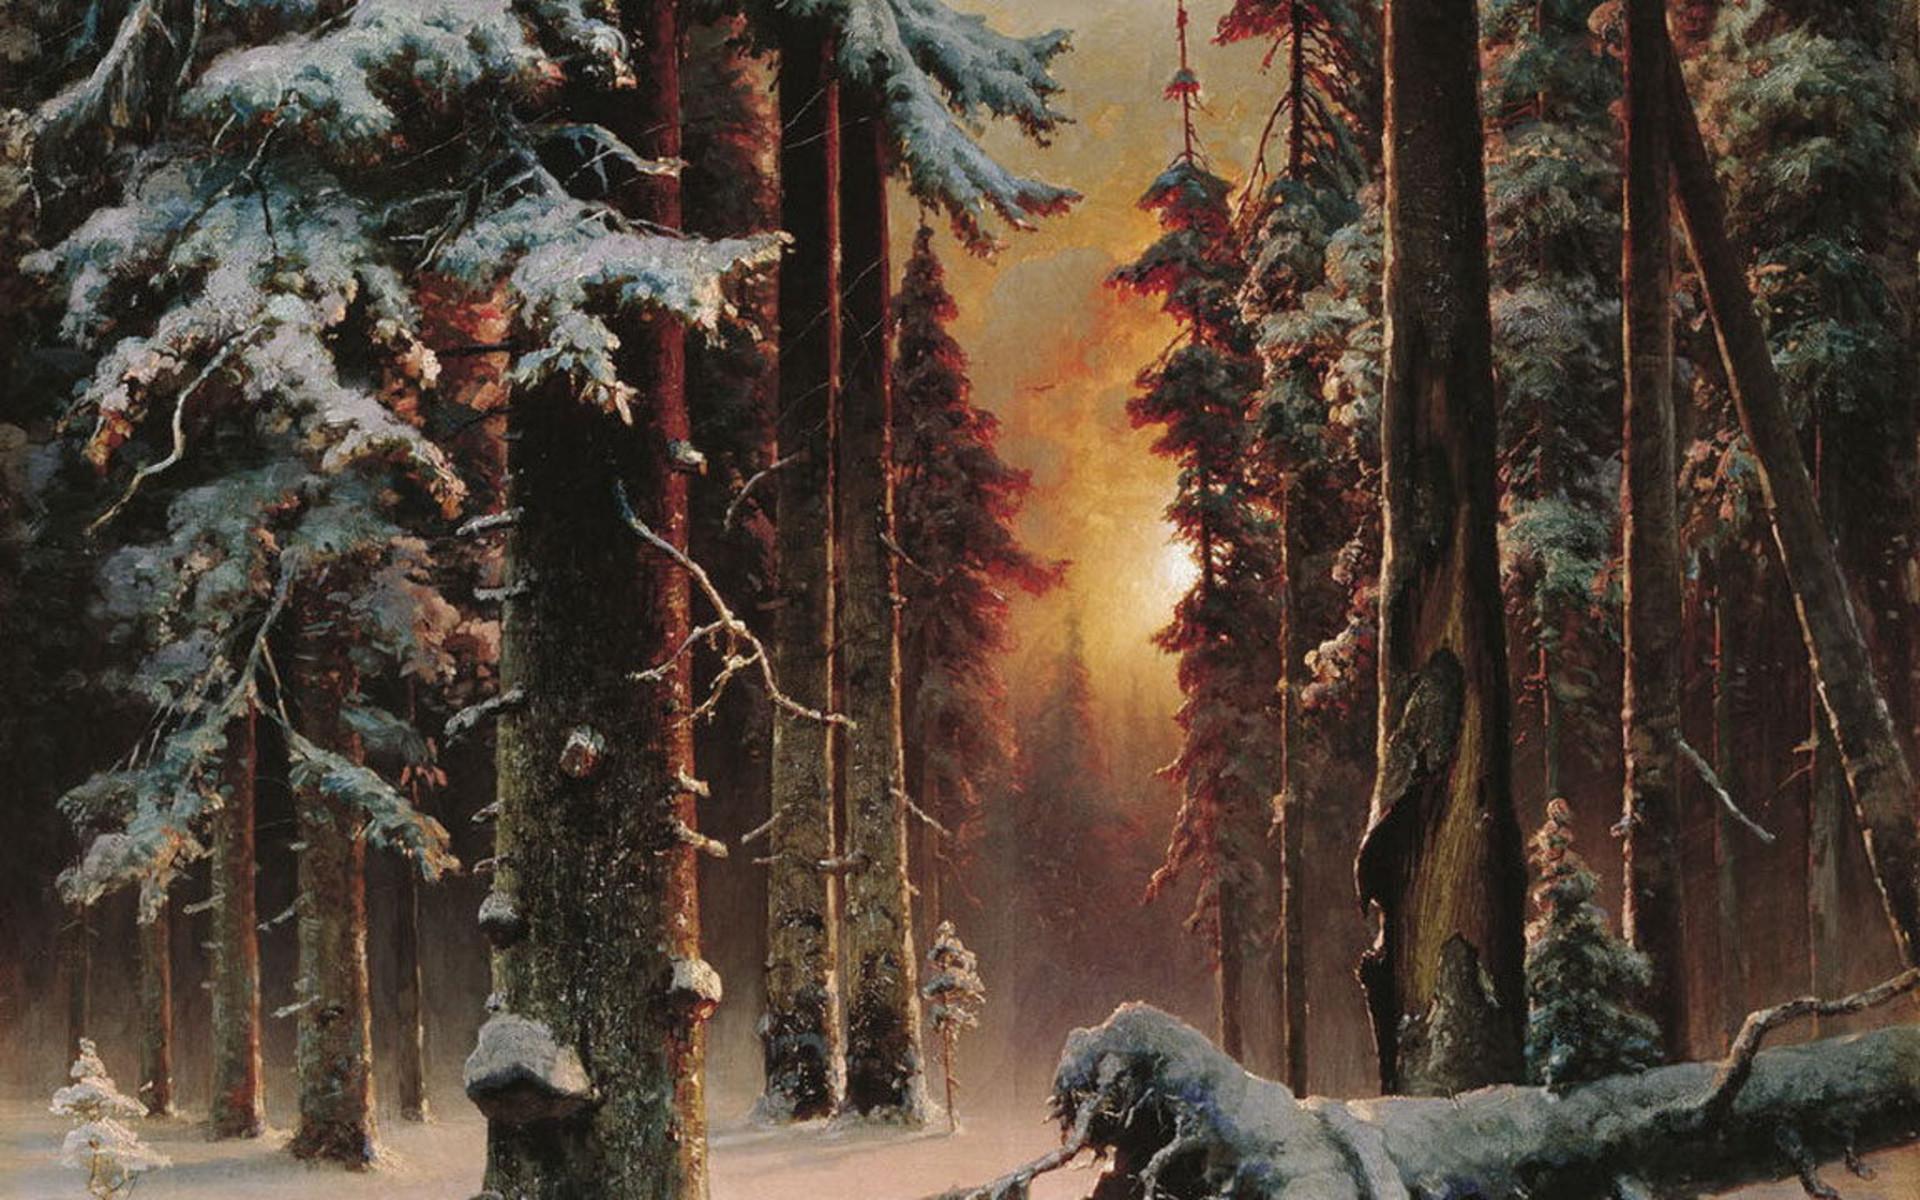 Artistiek - Natuur  - Bos - Snow - Winter Achtergrond